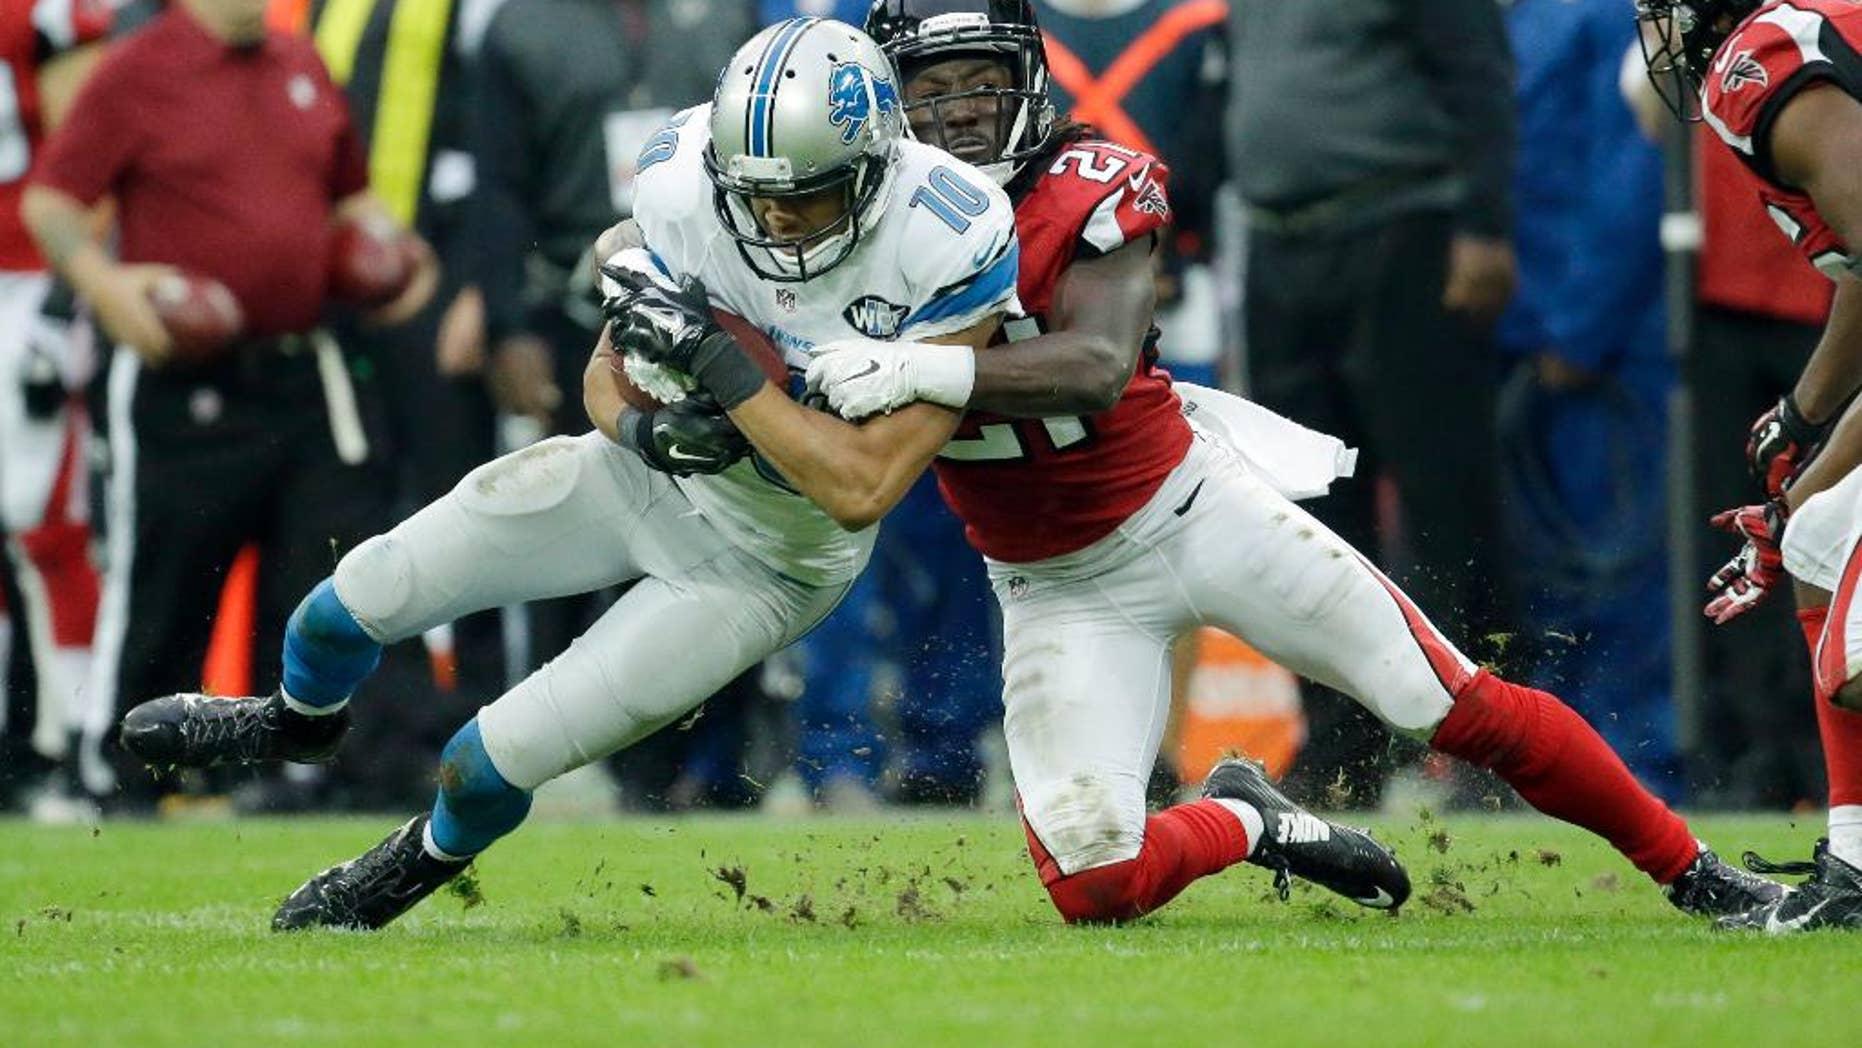 Atlanta Falcons cornerback Desmond Trufant (21) tackles Detroit Lions wide receiver Corey Fuller (10) in the second half of the NFL football game at Wembley Stadium, London, Sunday, Oct. 26, 2014.  (AP Photo/Matt Dunham)